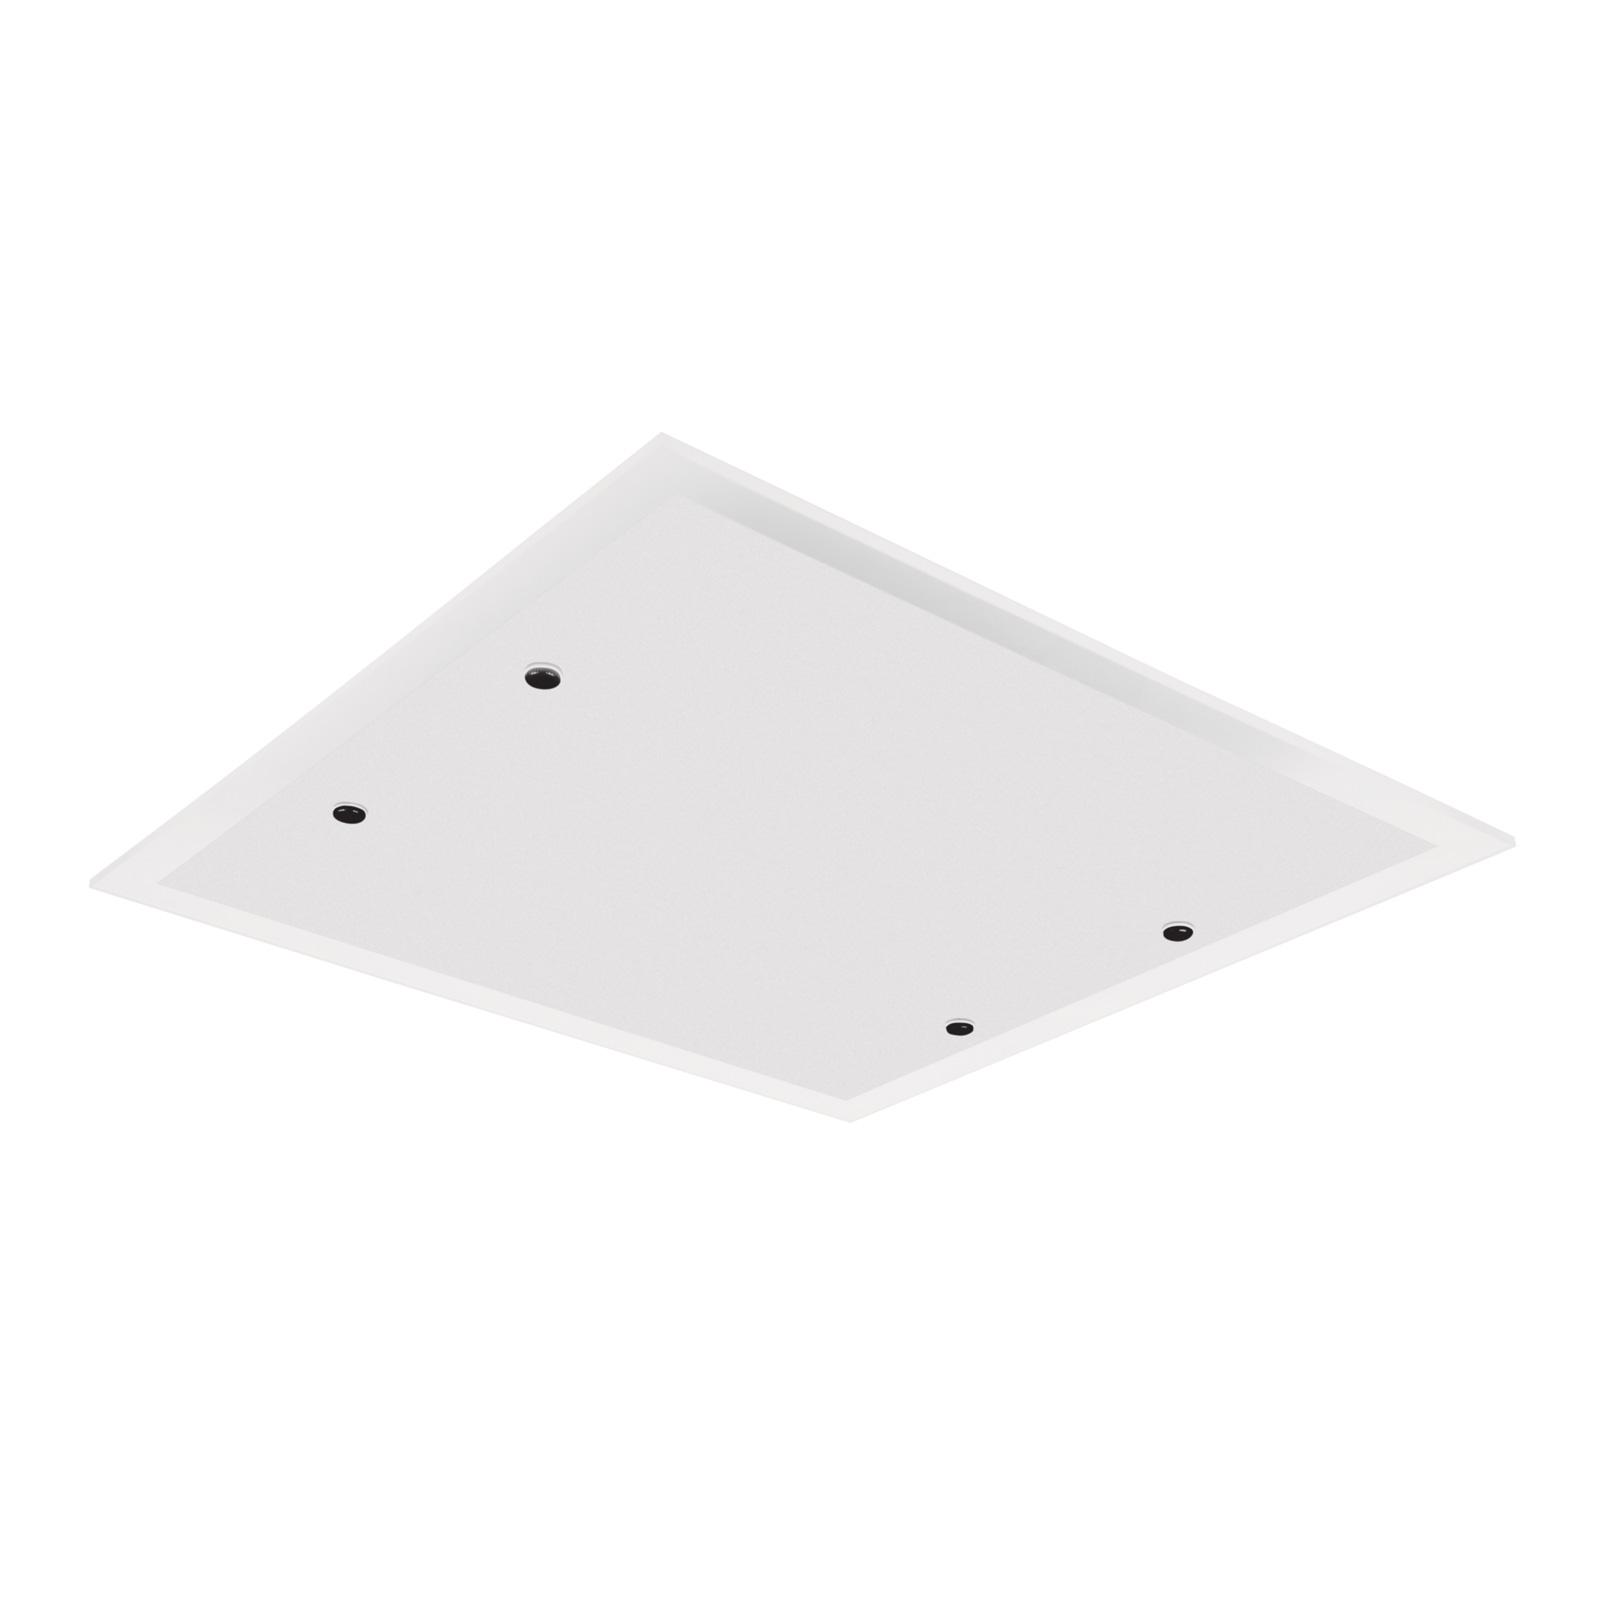 LEDVANCE Lunive Area lampa sufitowa 30cm 4000K